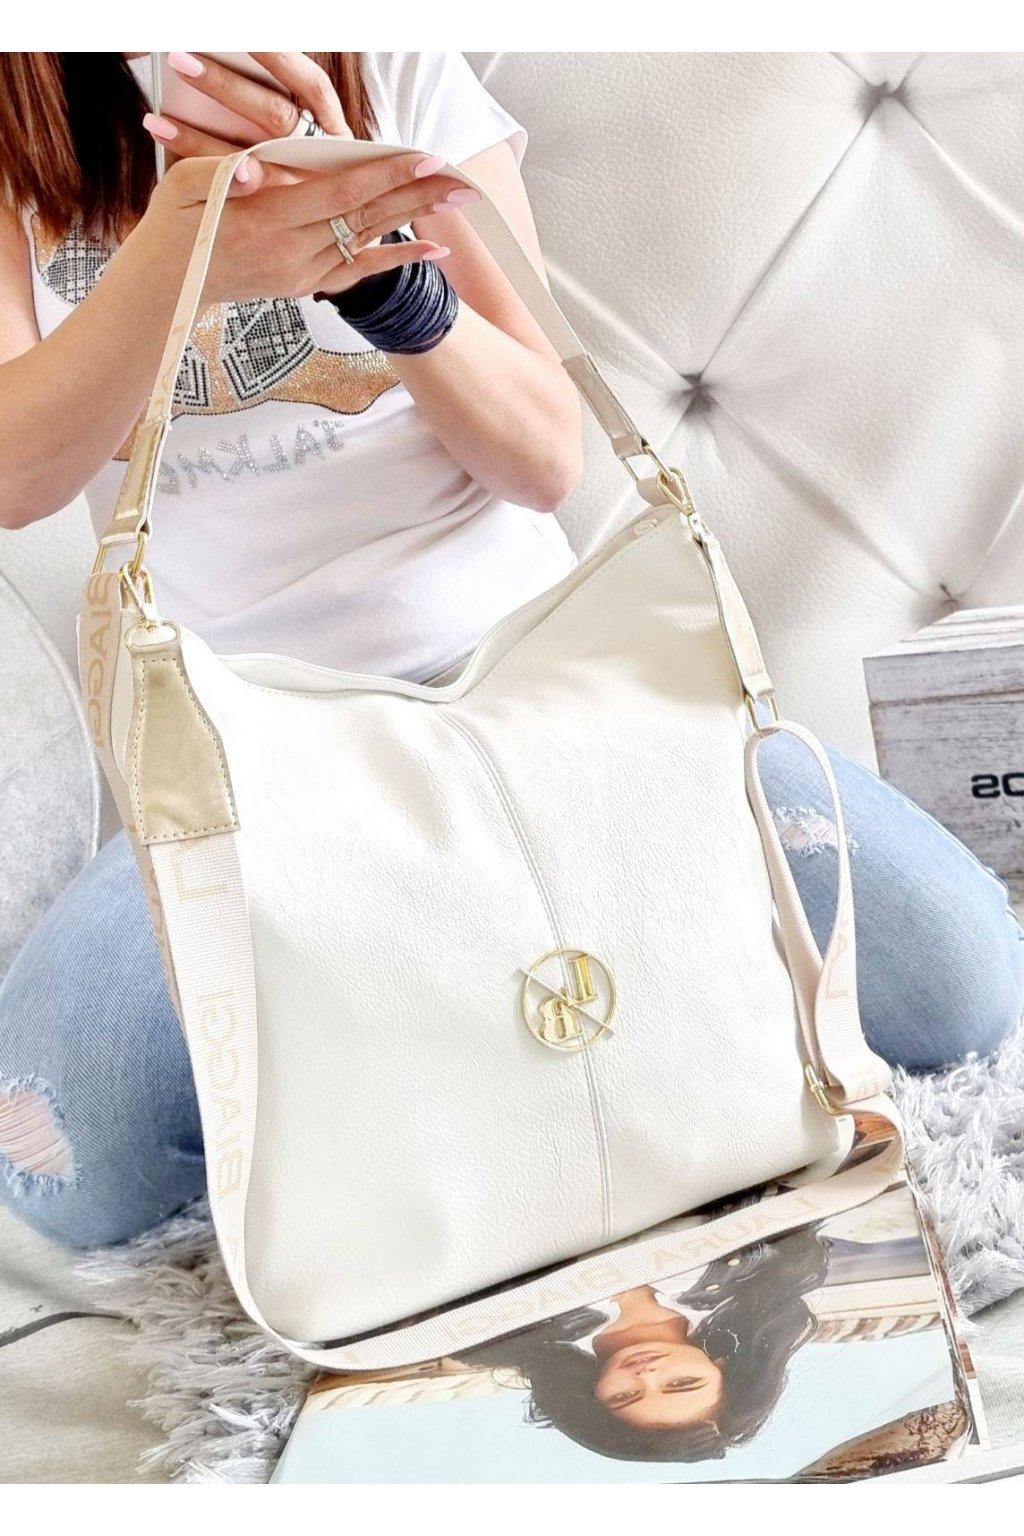 Dámská luxusní kabelka Laura Biaggi bílá